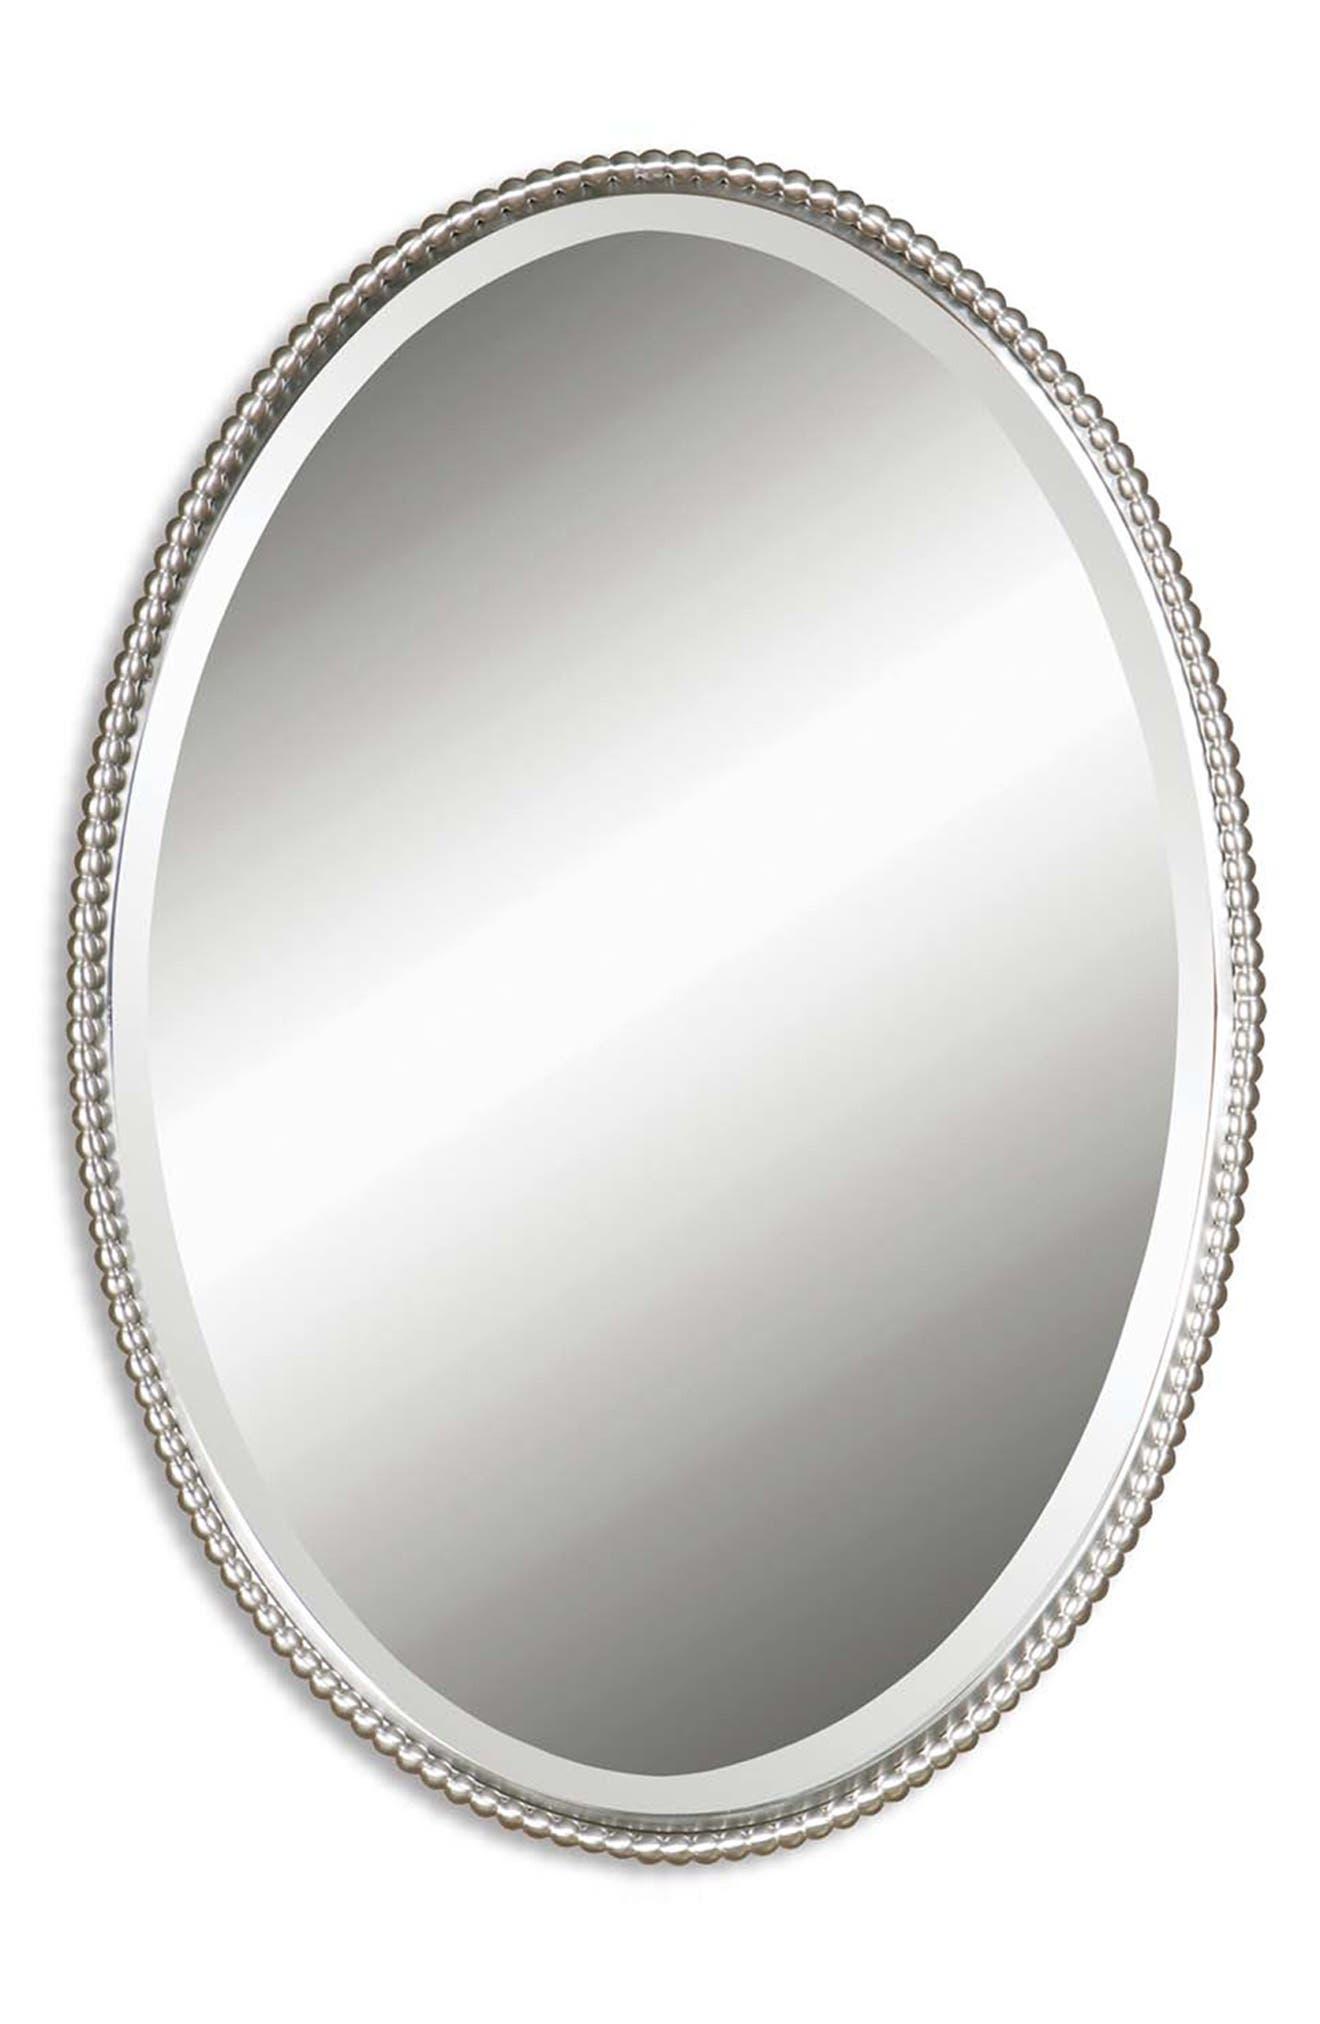 'Sherise' Oval Mirror,                             Alternate thumbnail 2, color,                             040